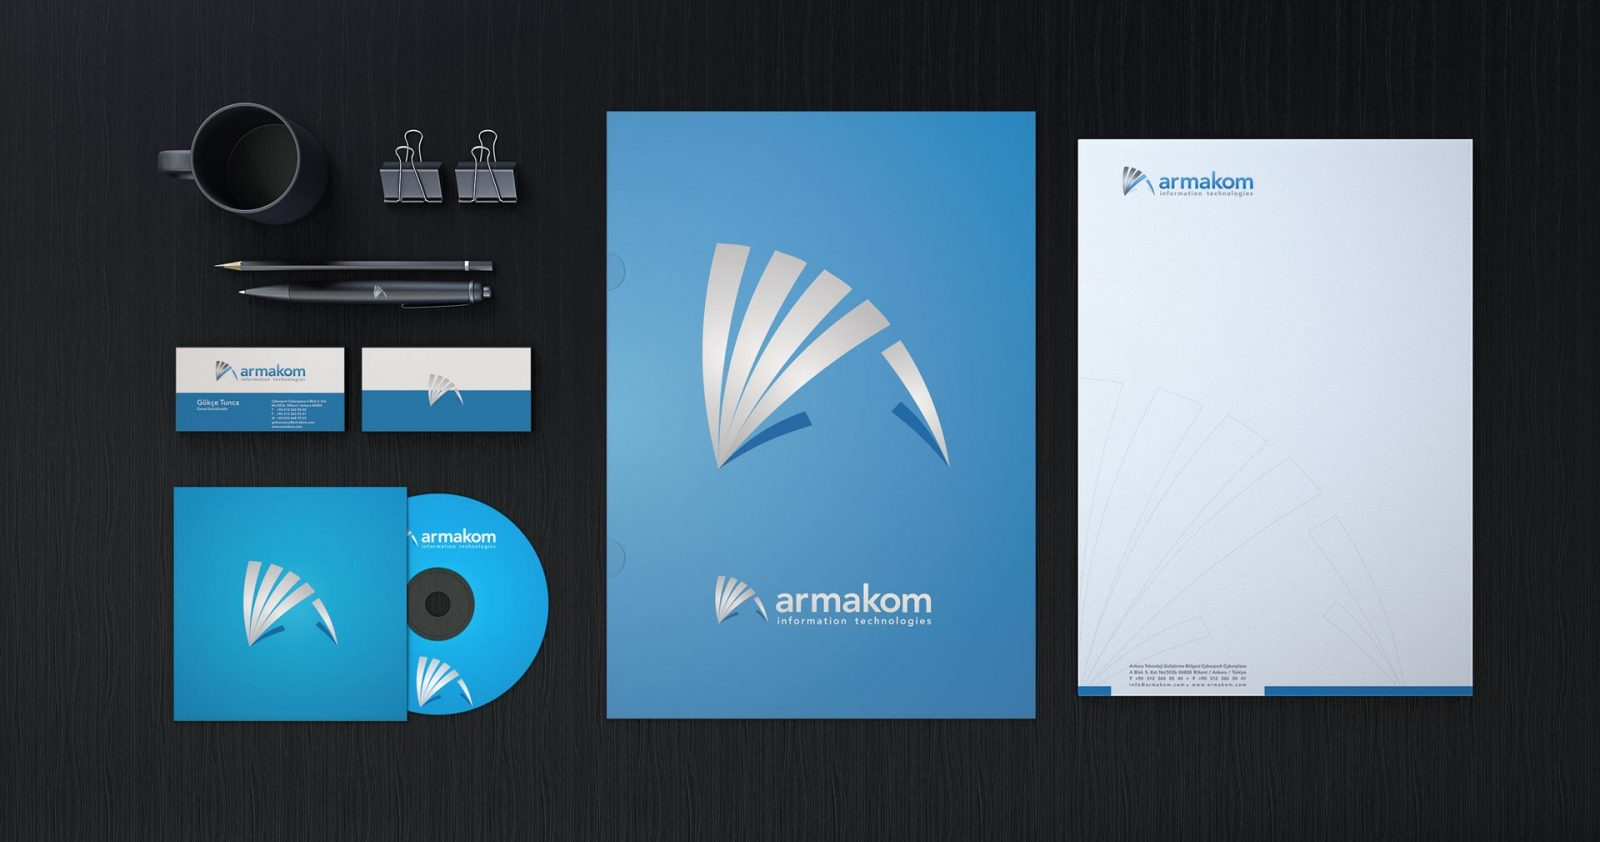 Armakom logo kurumsal kimlik tasarımı 03